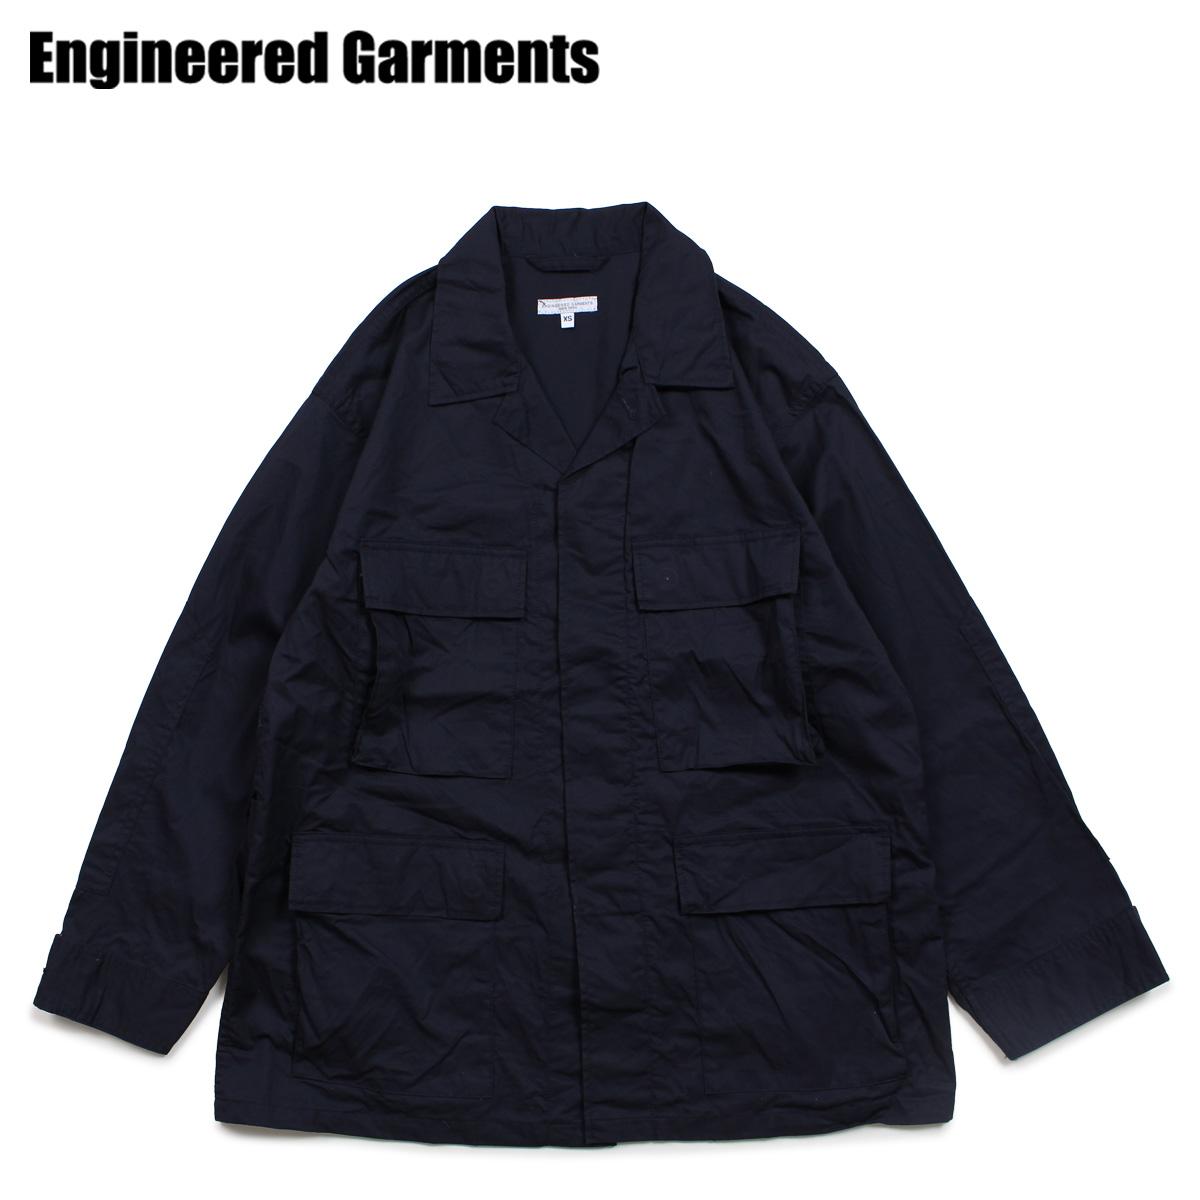 ENGINEERED GARMENTS エンジニアドガーメンツ ジャケット ミリタリージャケット メンズ BDU JACKET ダーク ネイビー 19SD002NV